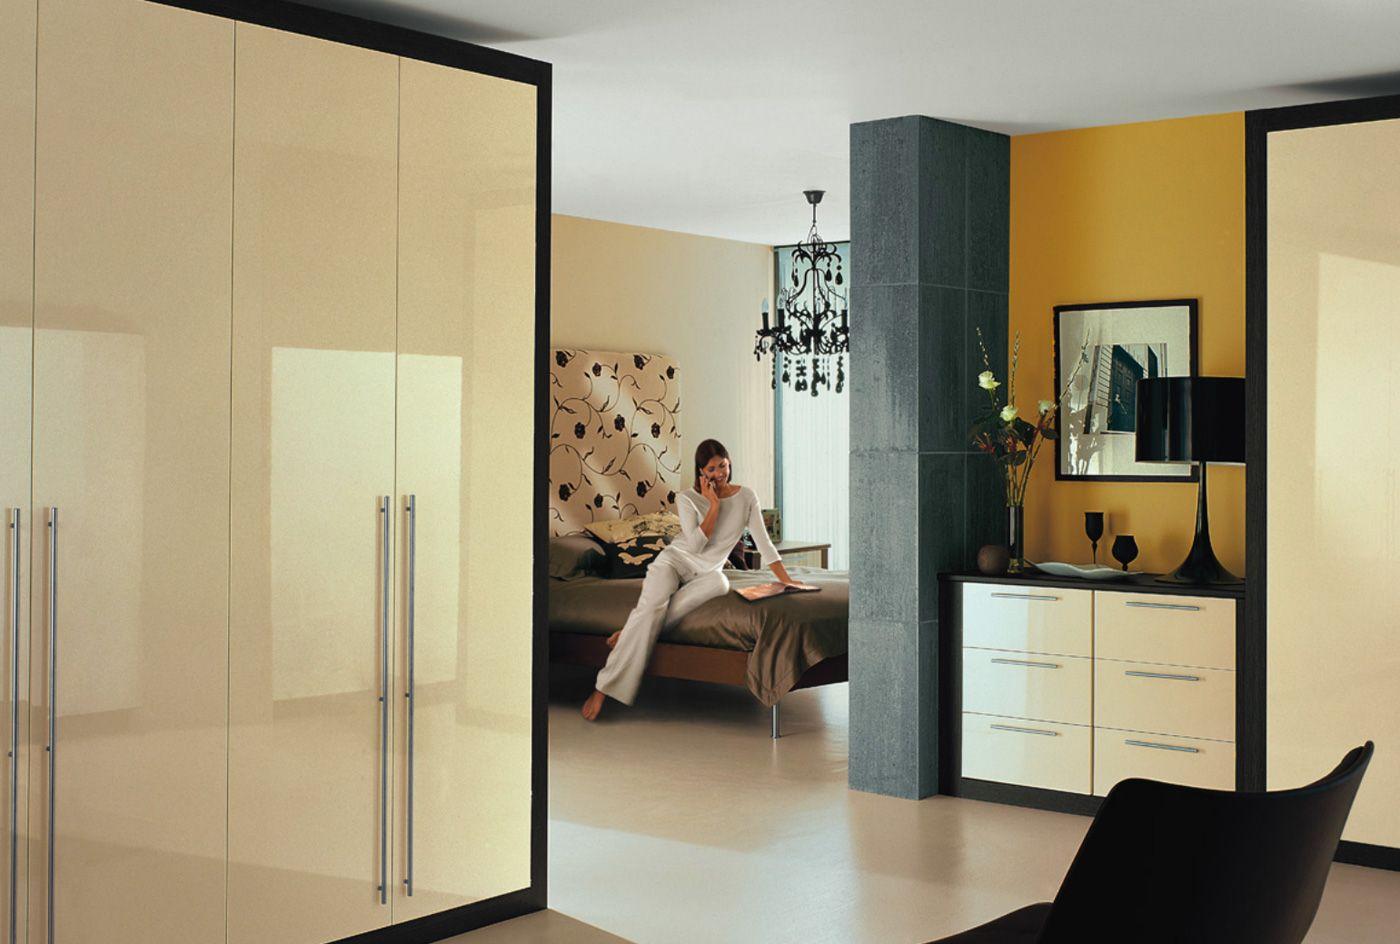 Cosmopolitan Bedroom Furniture Wardrobes Fitted Bedroom Furniture Fitted Bedrooms Contemporary Bedroom Furniture